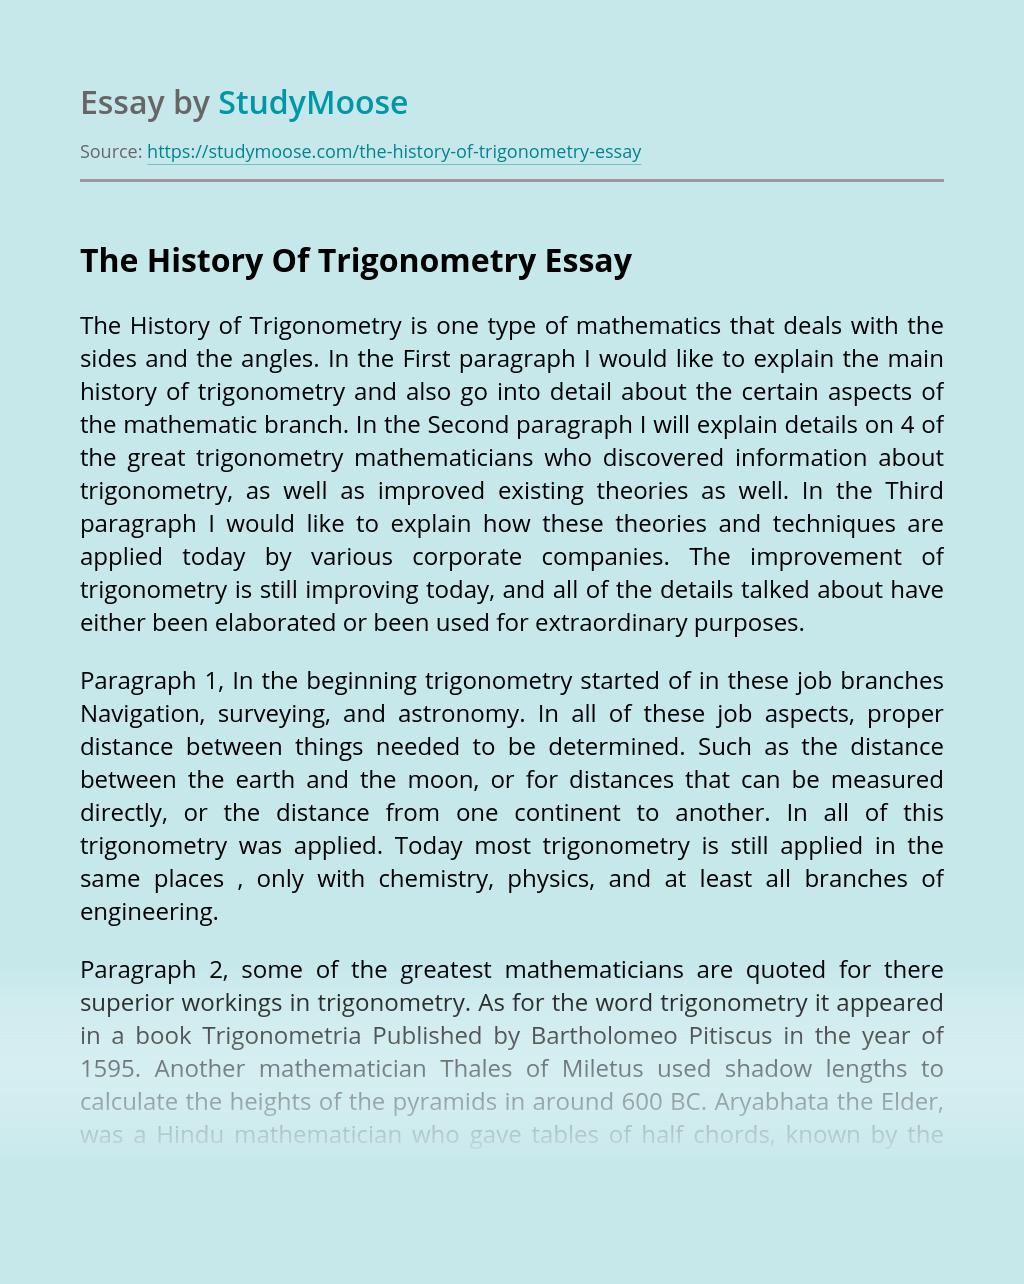 The History Of Trigonometry